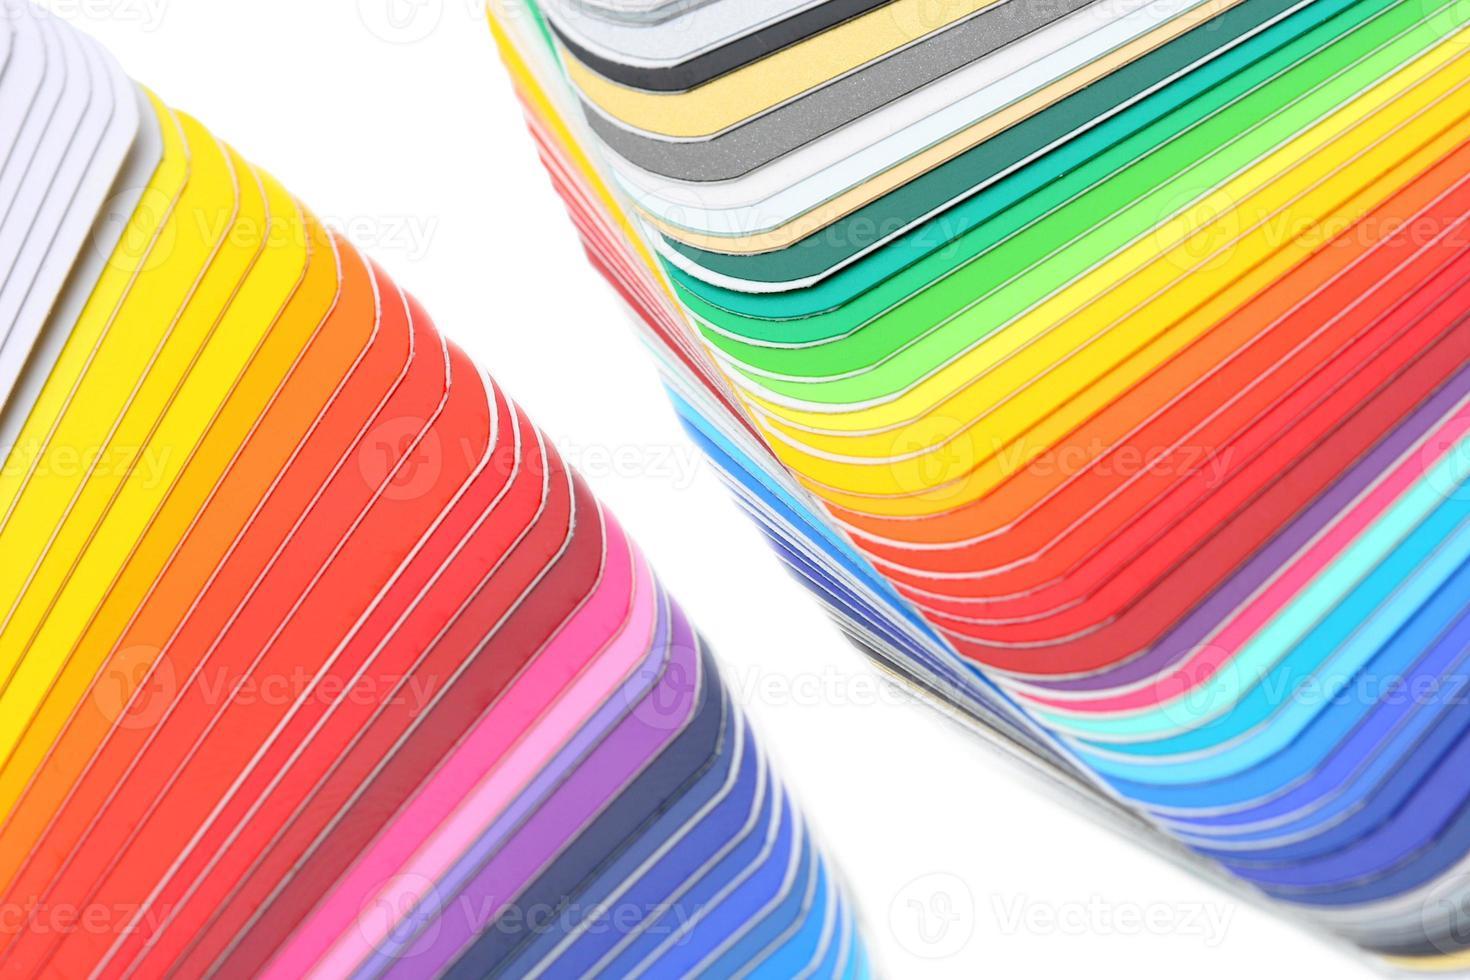 color guide close-up photo